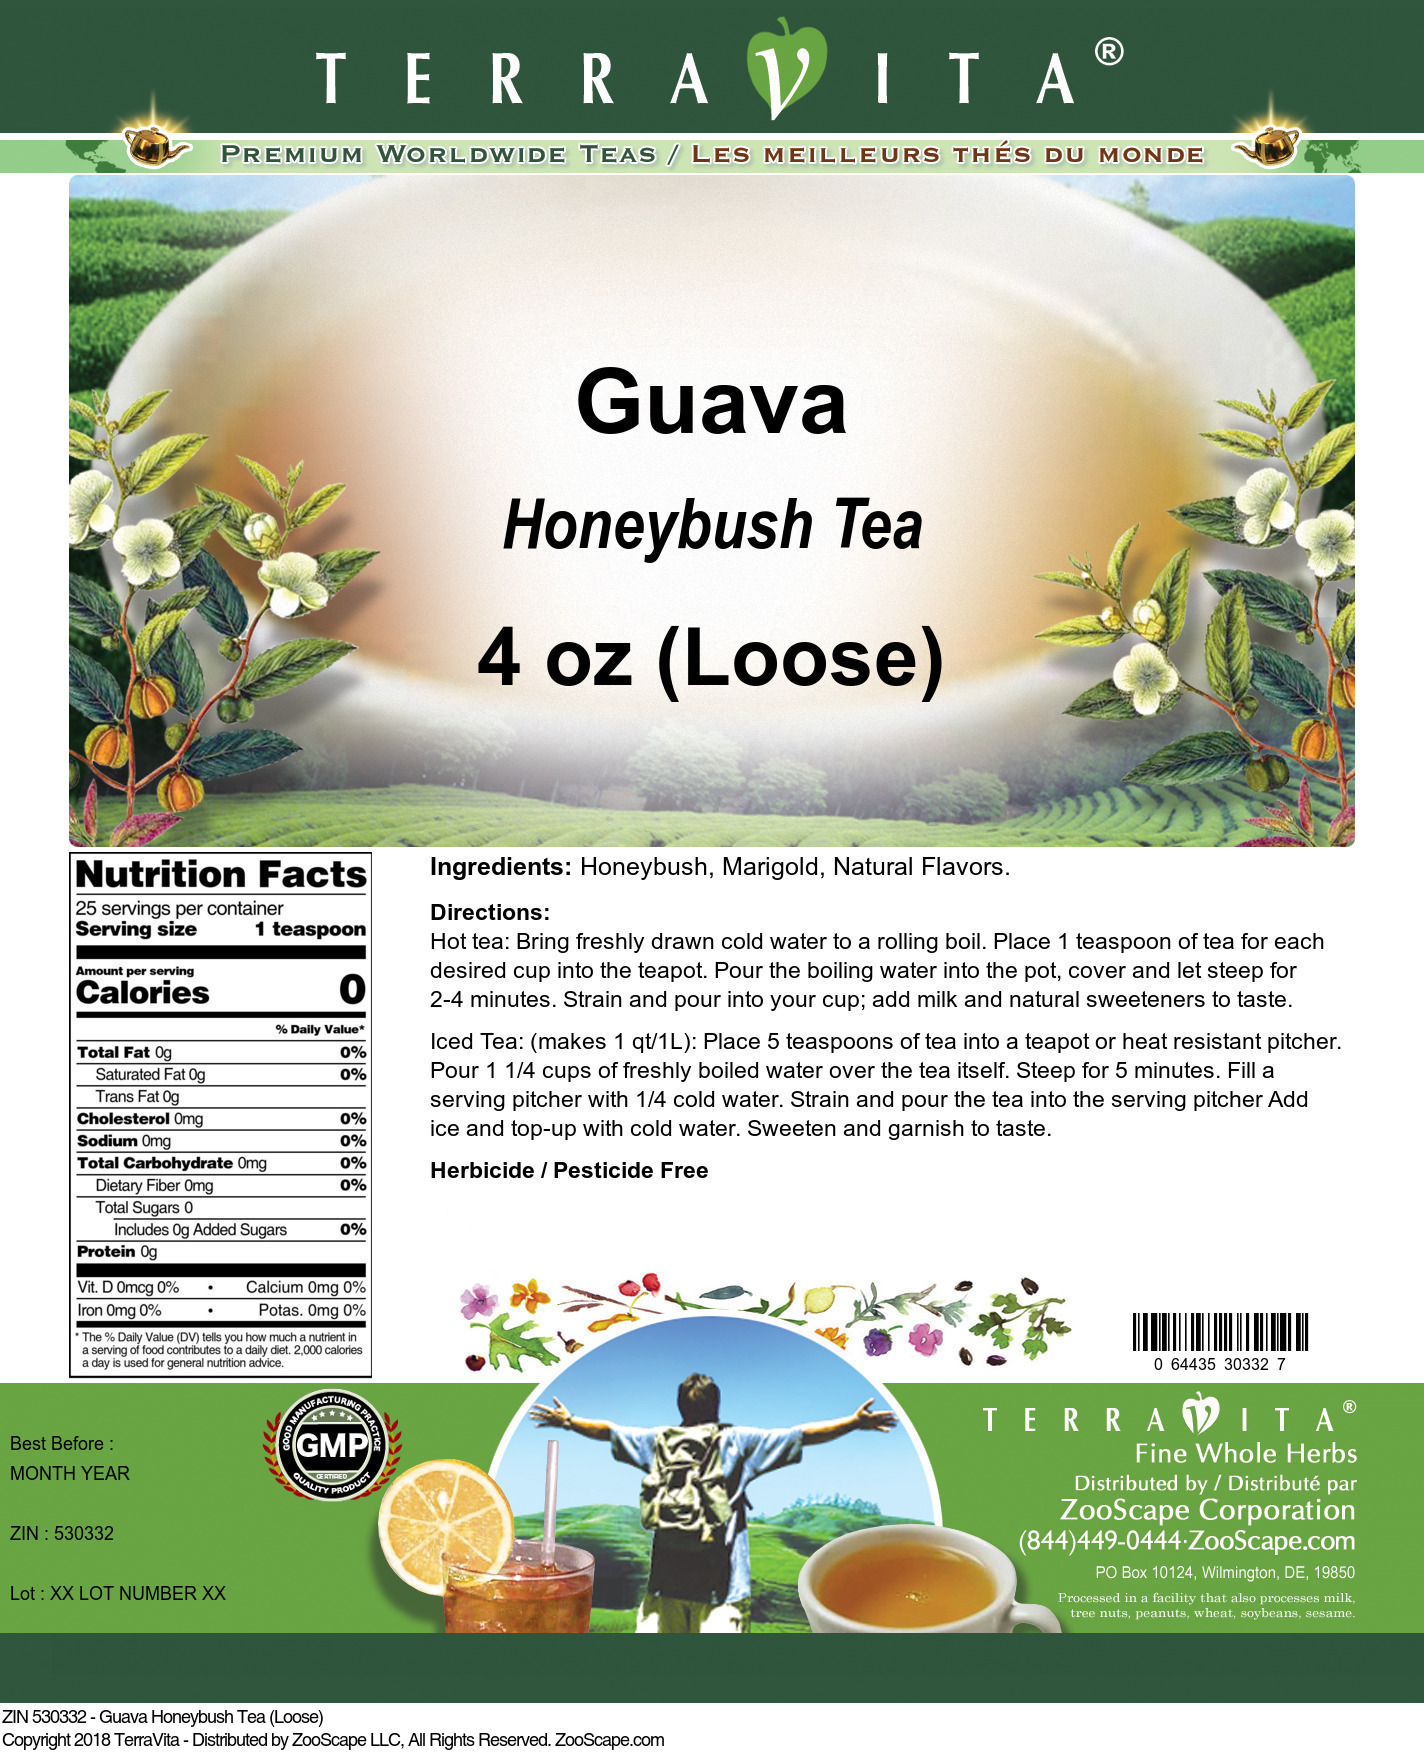 Guava Honeybush Tea (Loose)